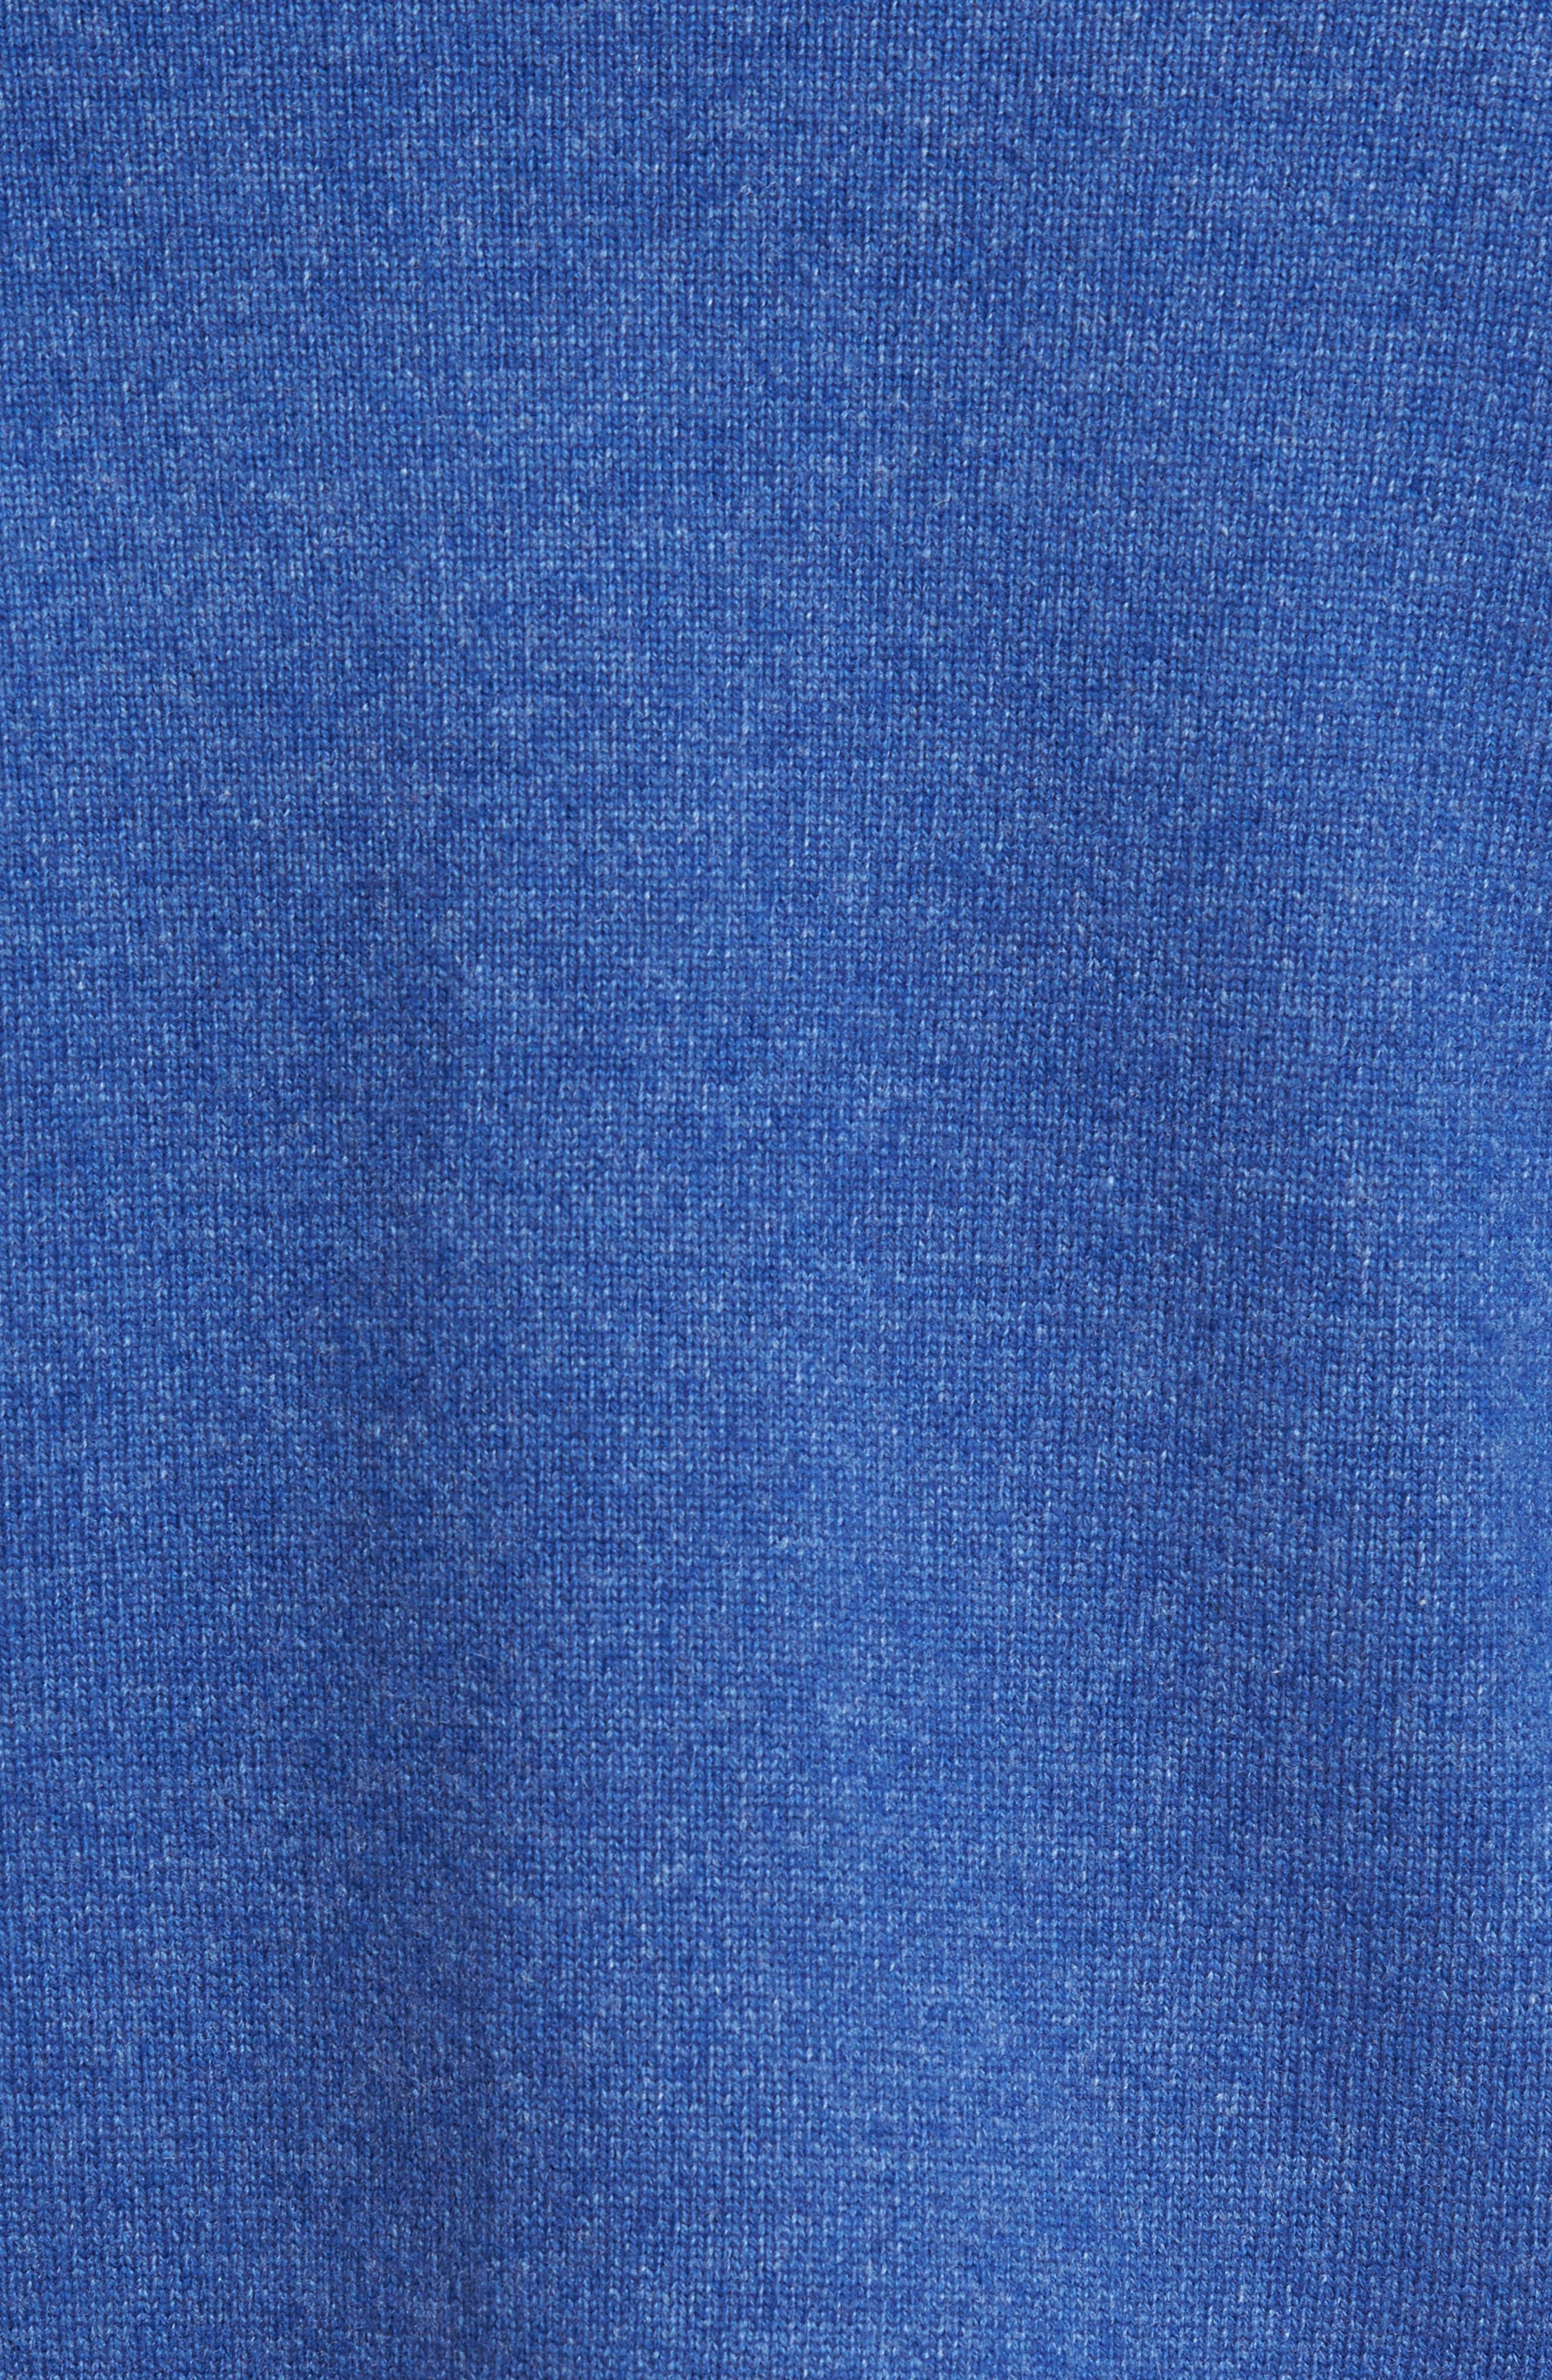 Crown Vintage Crewneck Sweatshirt,                             Alternate thumbnail 10, color,